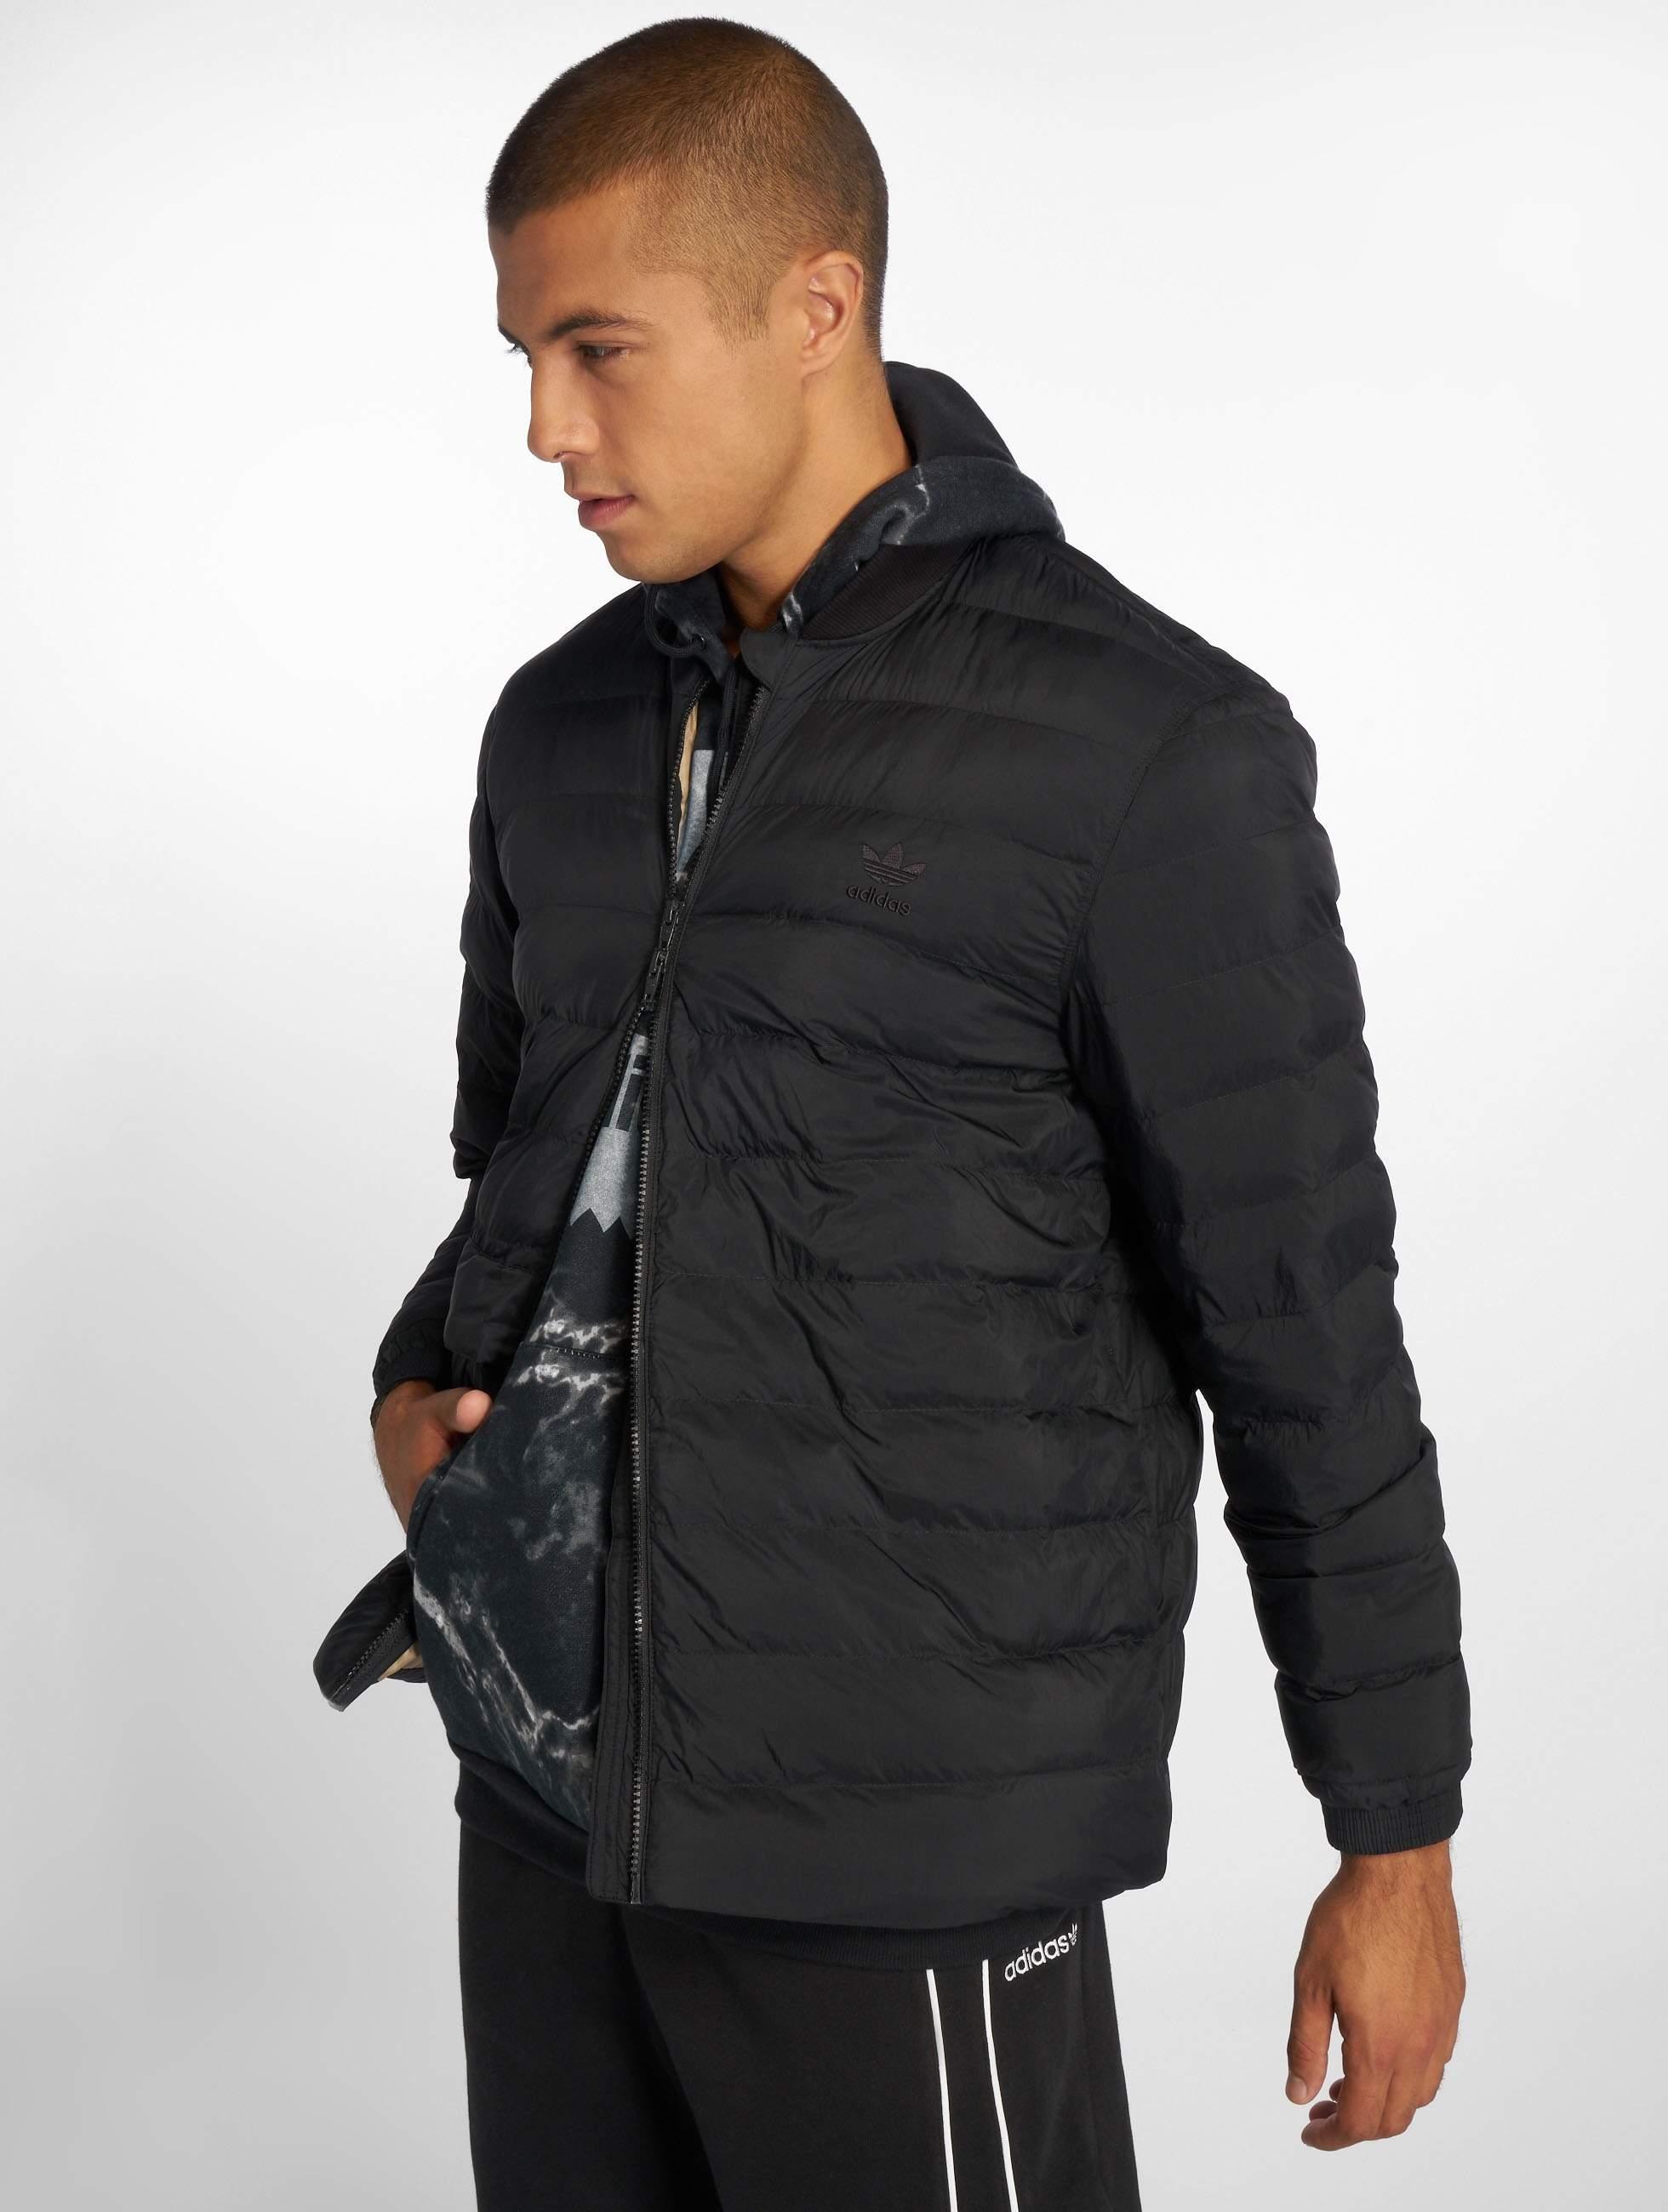 Adidas Originals Sst Outdr Atric Transition Jacket Black